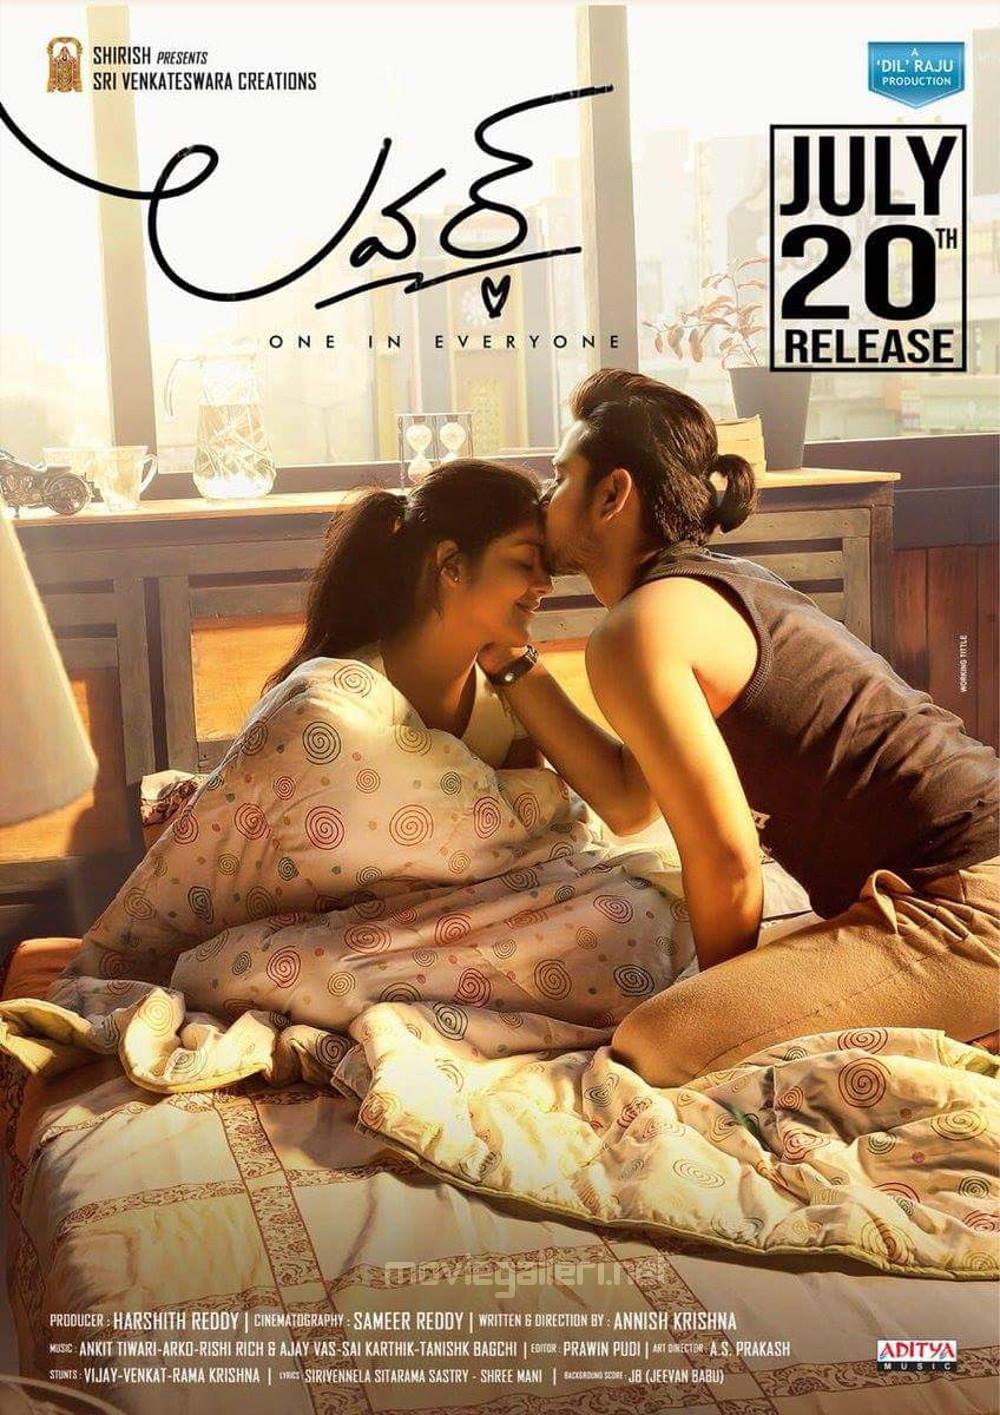 Riddhi Kumar Raj Tarun Lover Movie Release Date July 20th Posters